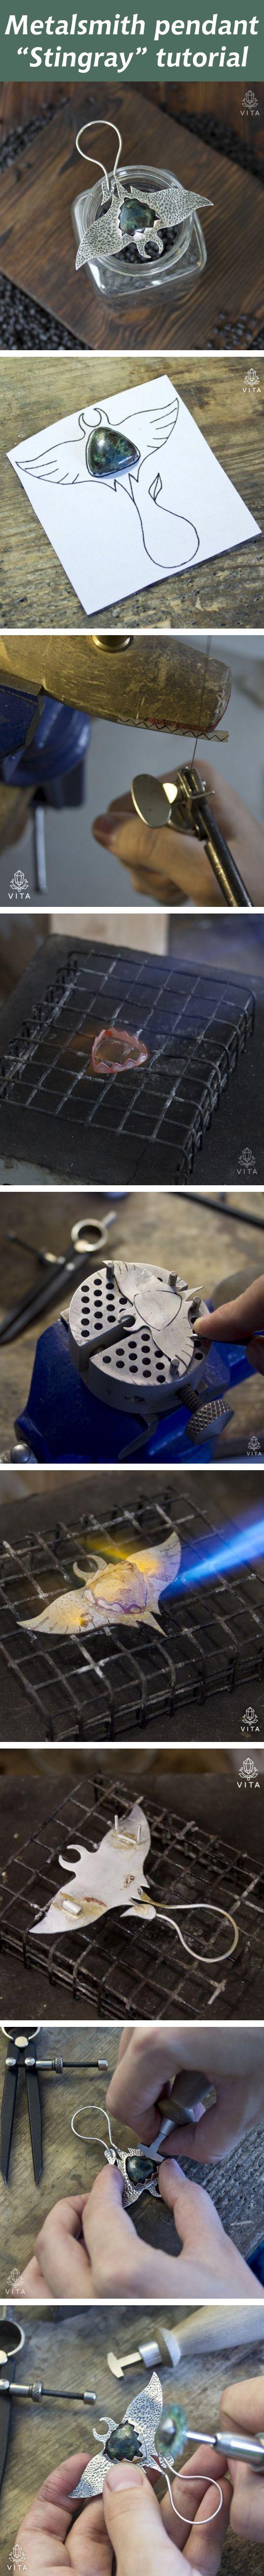 "Metalsmith pendant ""Stingray"" tutorial"